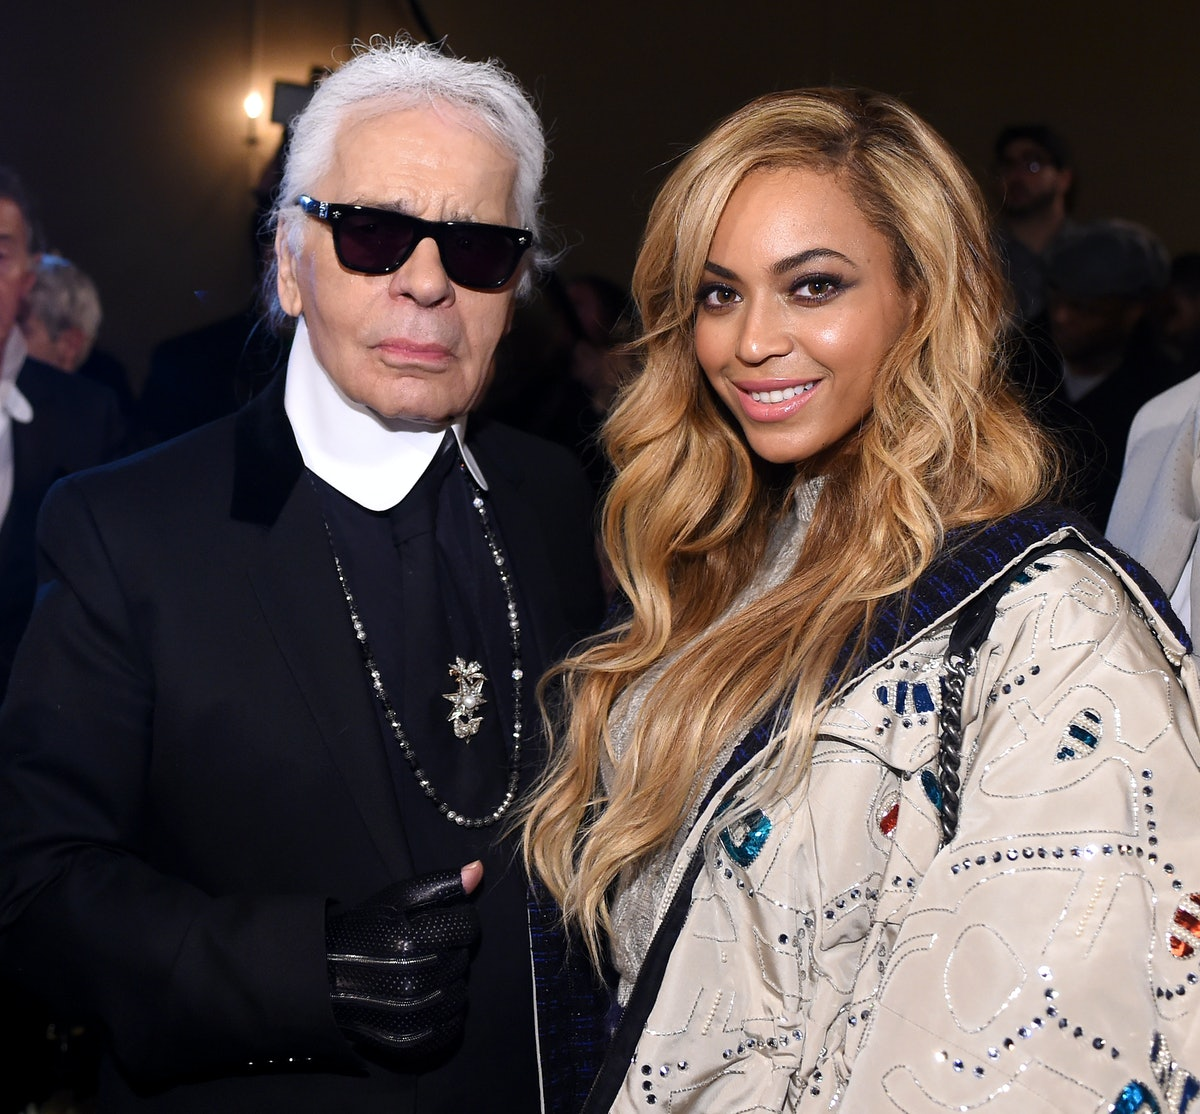 Karl Lagerfeld and Beyoncé